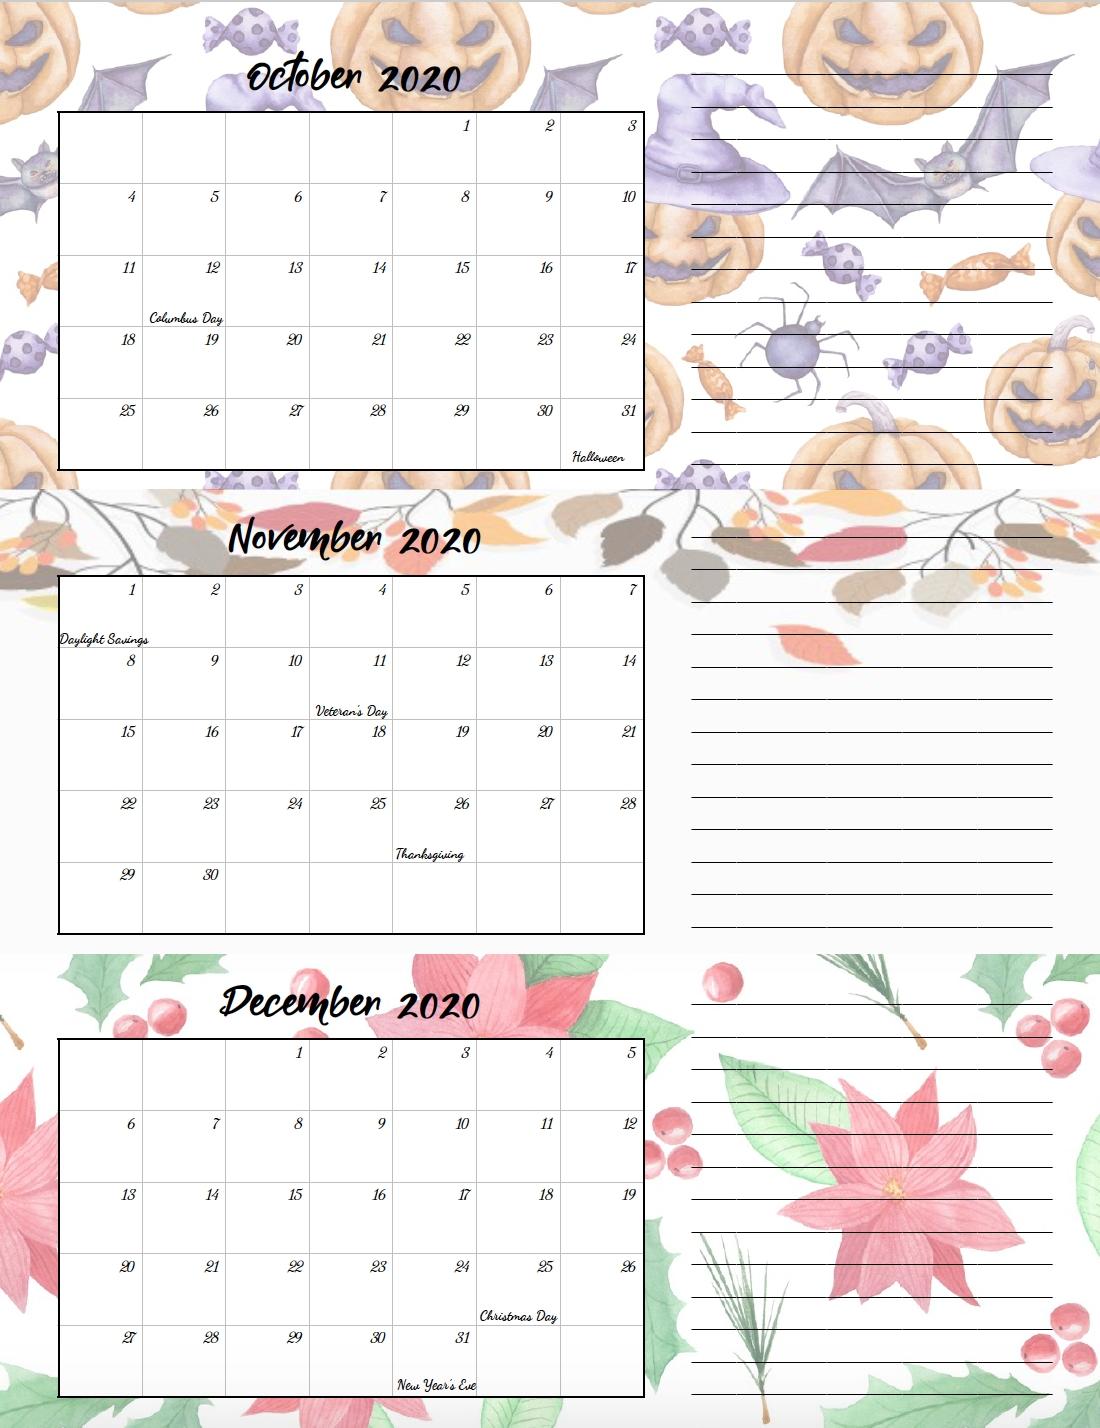 Free Printable 2020 Quarterly Calendars With Holidays: 3 pertaining to Calendar For Quarterly 2020 Printable